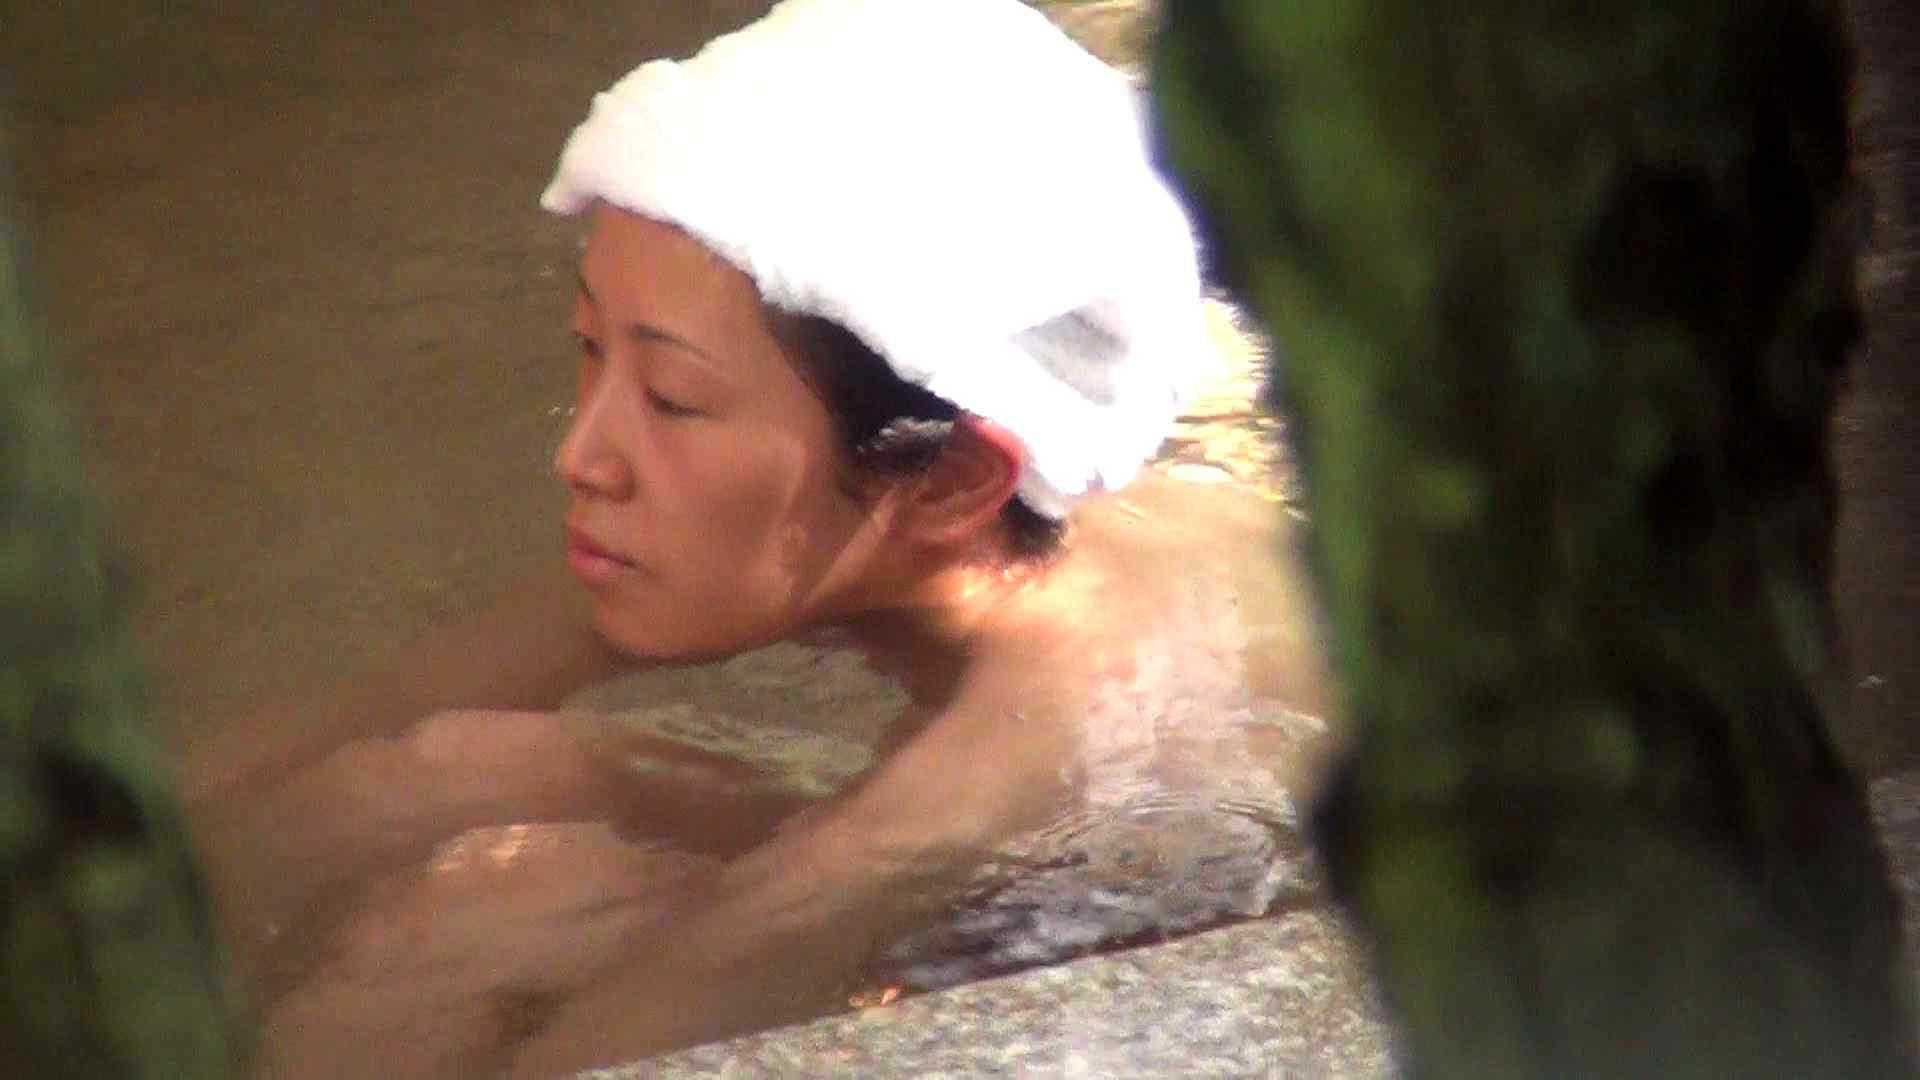 Vol.51 醤油j顔のお女市さん 胸の割りに下半身はがっちりタイプ 露天丸見え  79画像 60